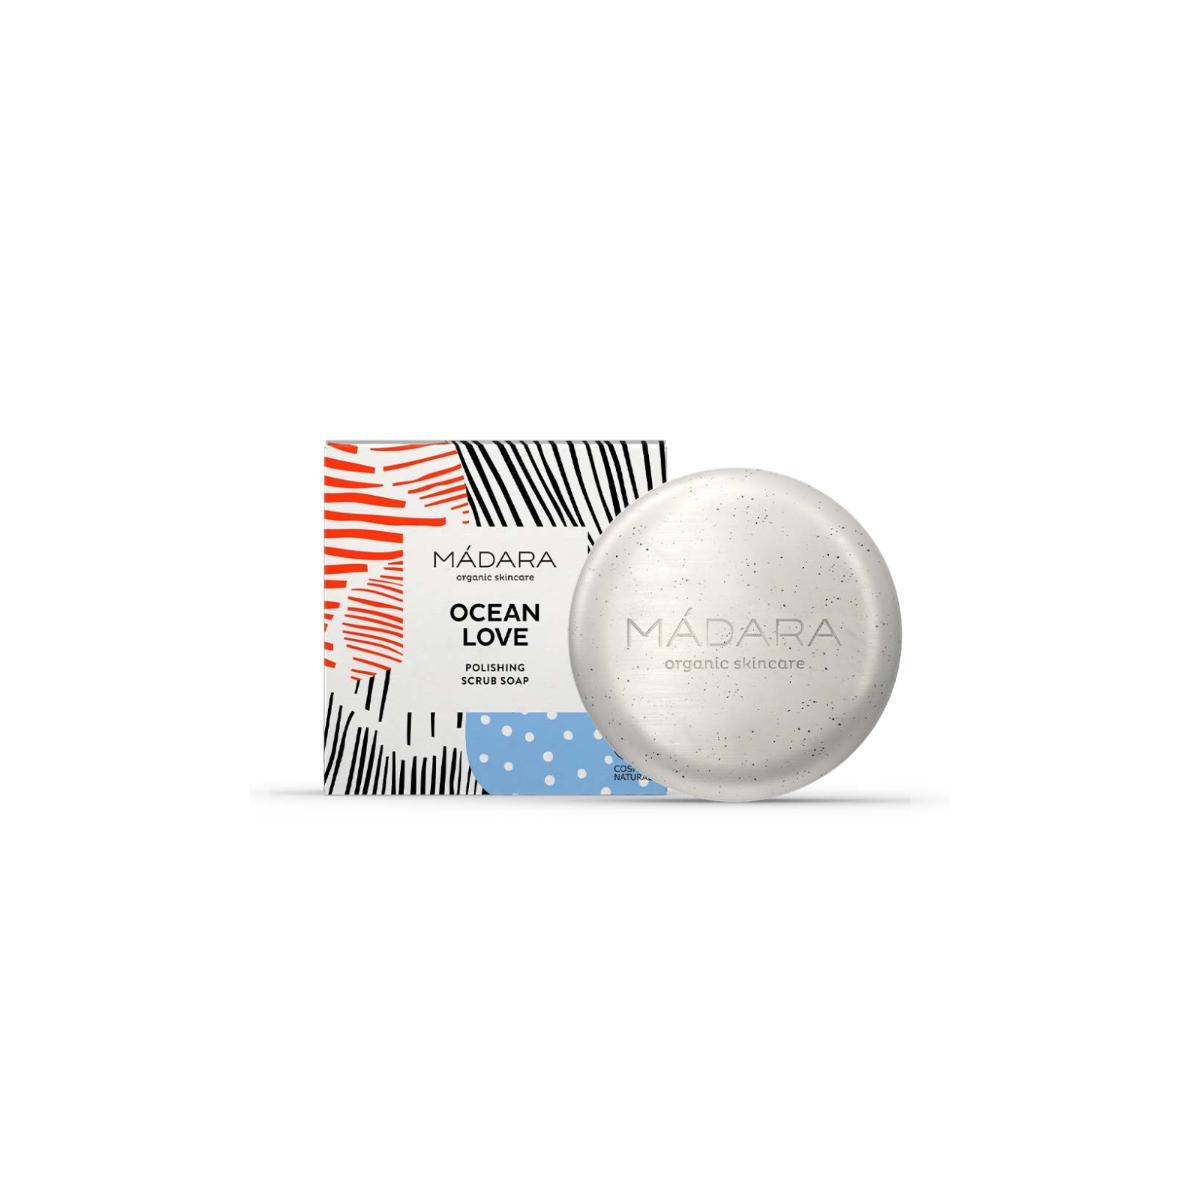 MÁDARA OCEAN LOVE Polishing Scrub Soap, čisticí mýdlo 90 g